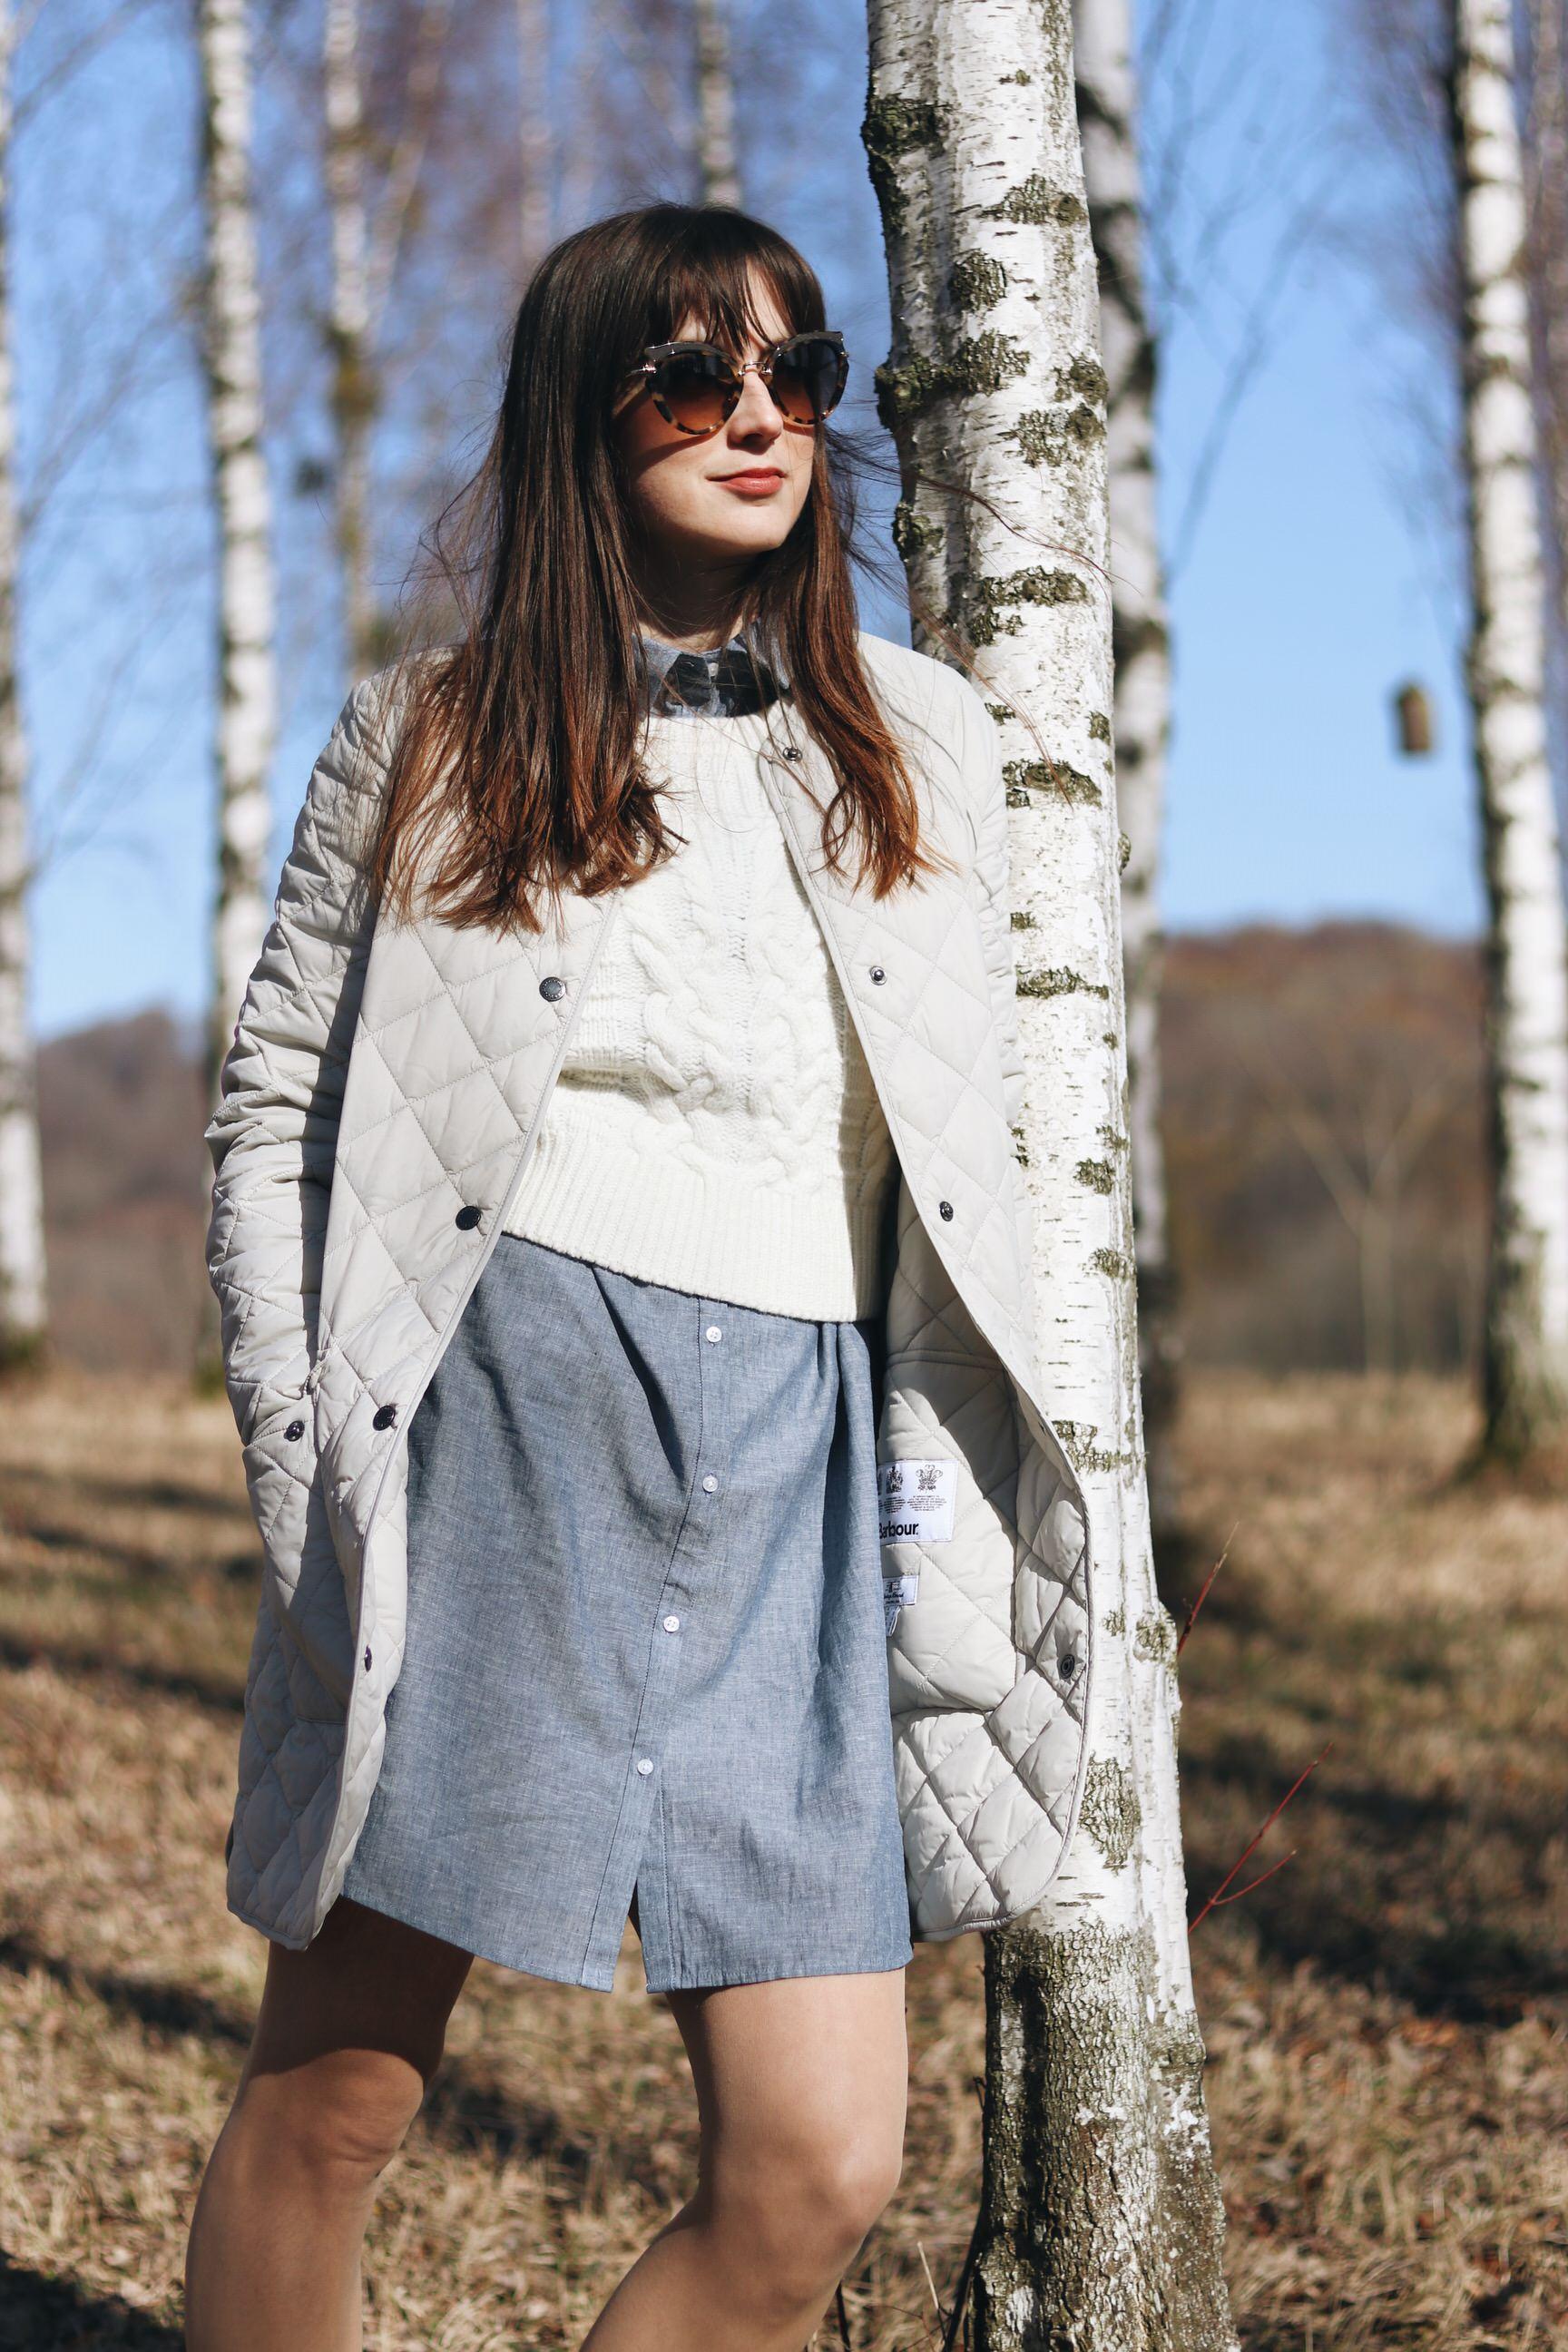 Barbour Steppmantel Longbluse blau outfit Fruehling Trends Blog Modeblog